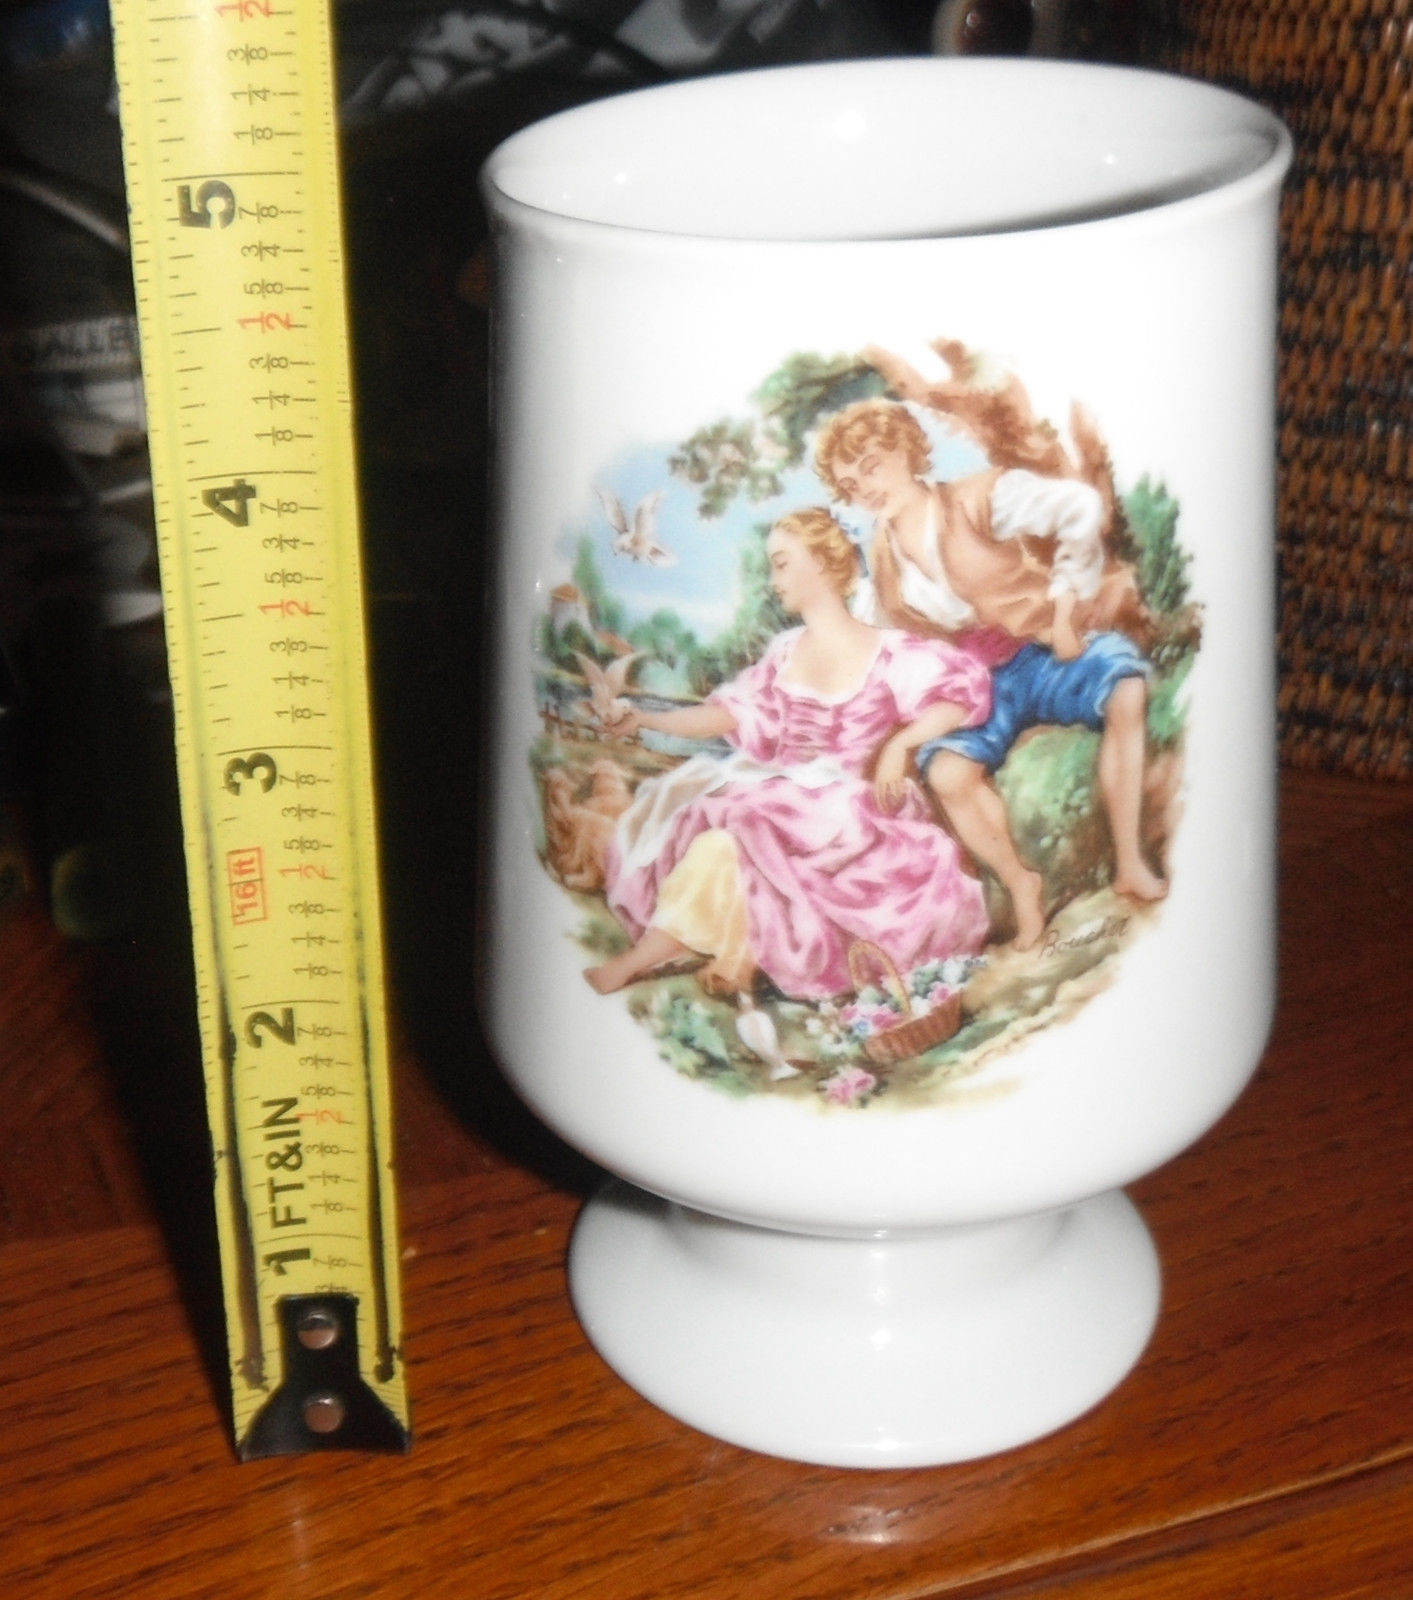 kaiser vase west germany of kaiser w germany small porcelain vase 9 99 picclick within kaiser w germany small porcelain vase 1 of 6only 1 available